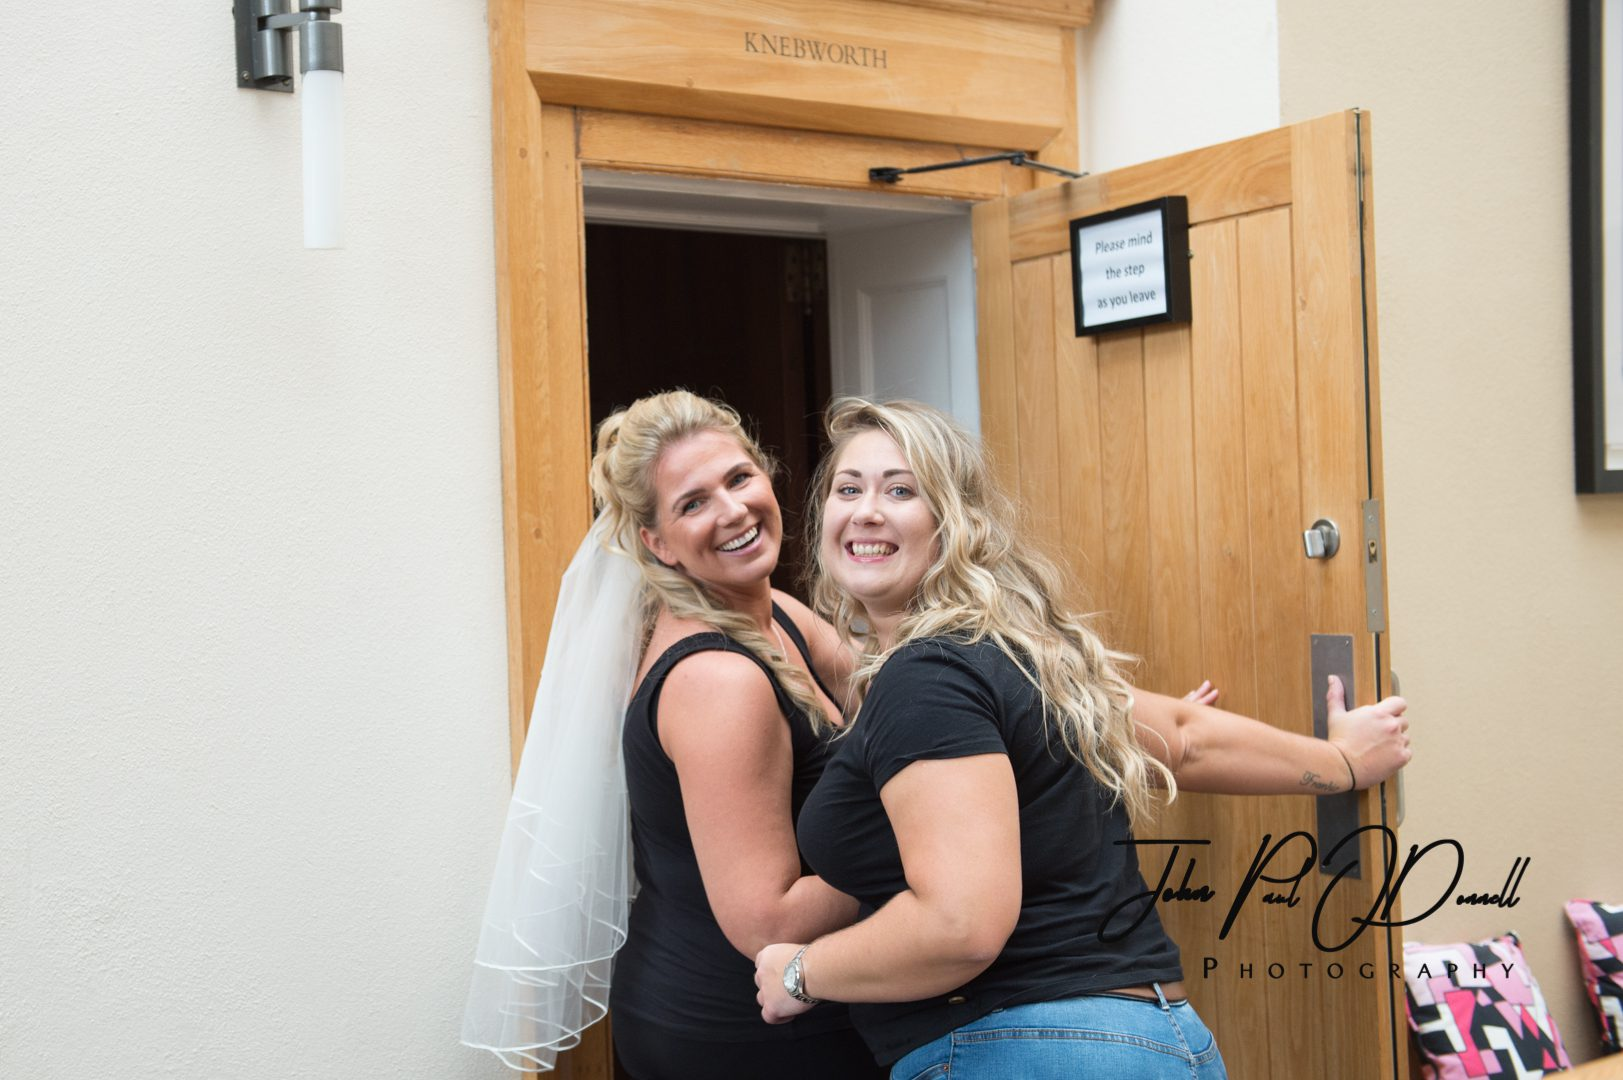 Danielle and Roberts Wedding at Fanhams Hall